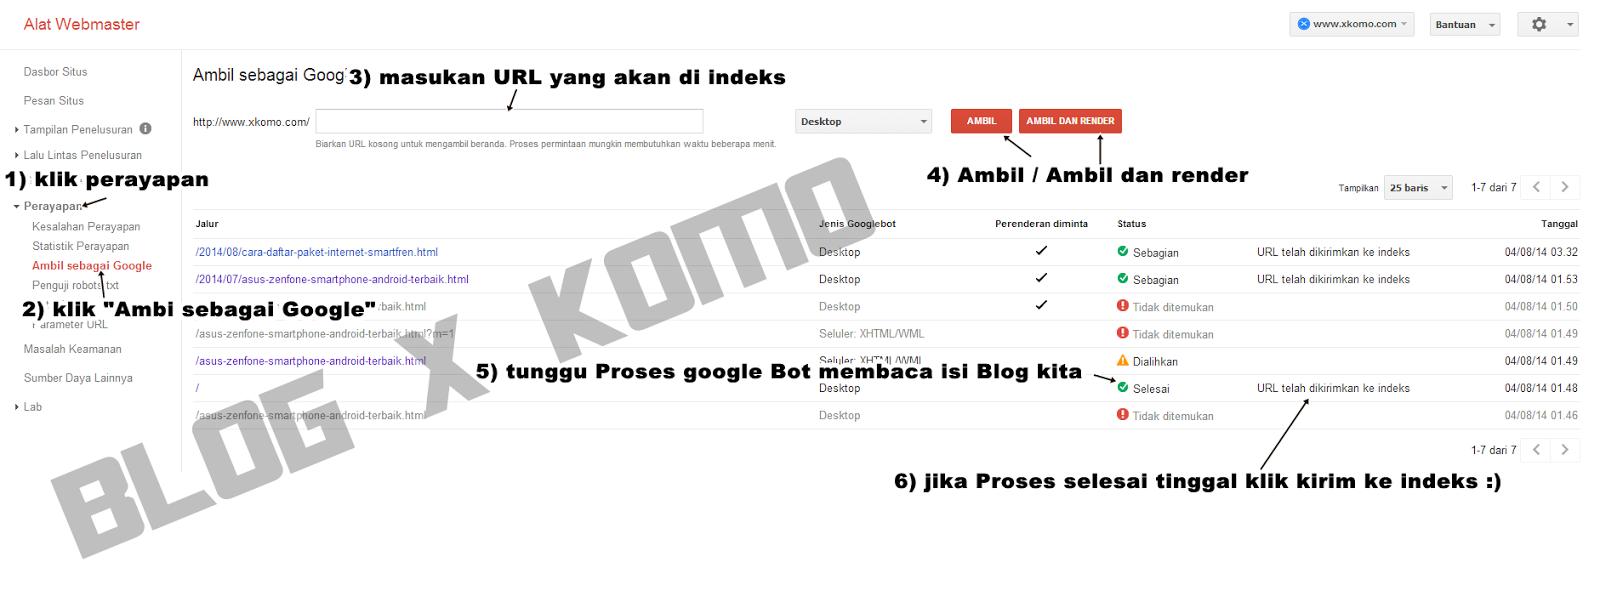 Cara Meng-Indeks Cepat URL Blog Ke Google via alat webmaster Perayapan Ambil sebagai Google